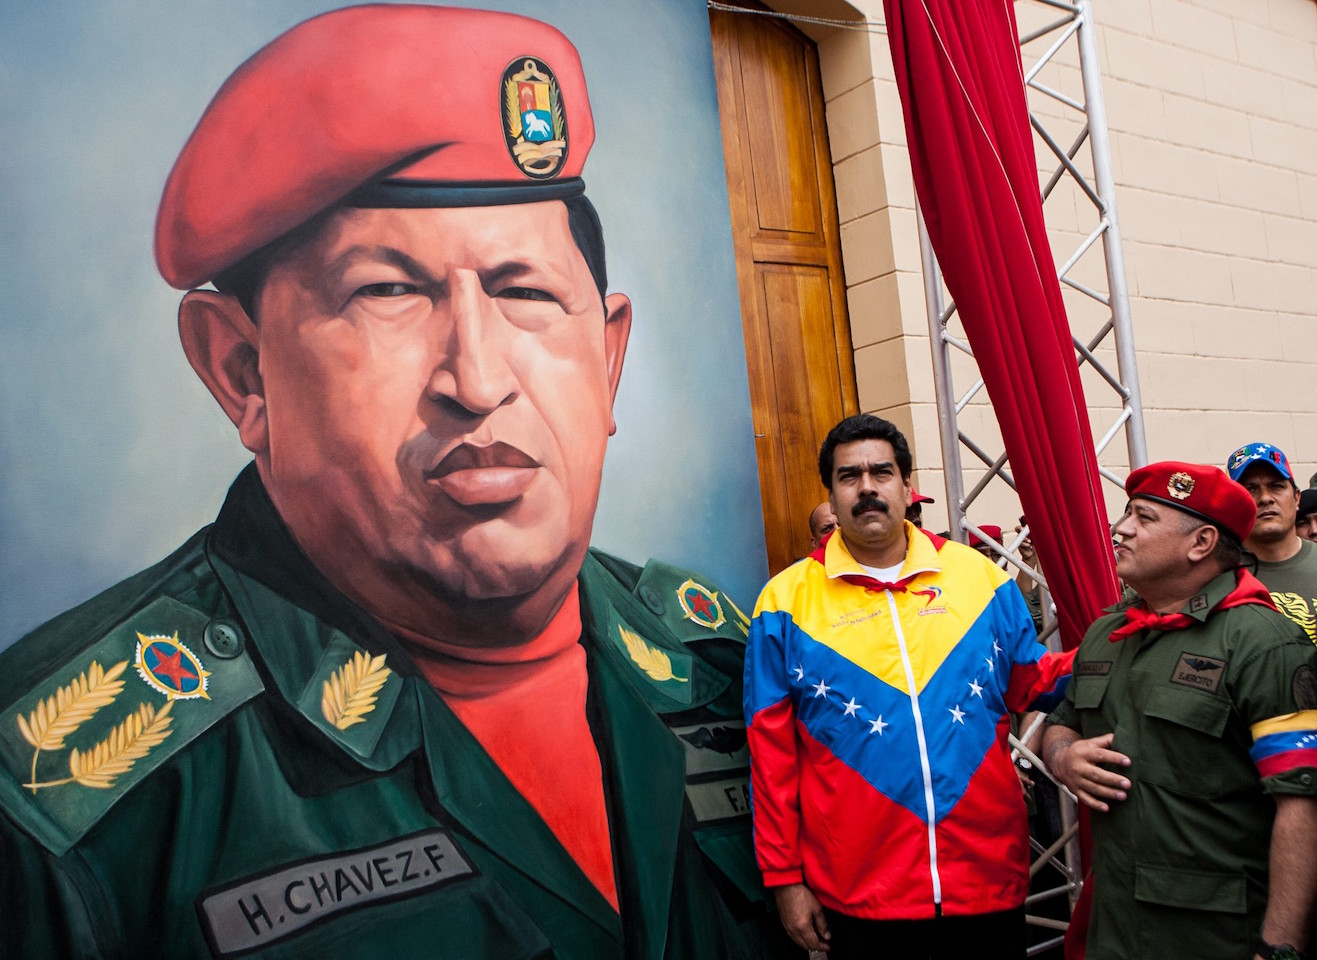 Venezuelan President Nicolas Maduro poses with Socialist Party Vice-President Diosdado Cabello next to a portrait of Hugo Chavez. (Photo by Jorge Silva/Reuters)